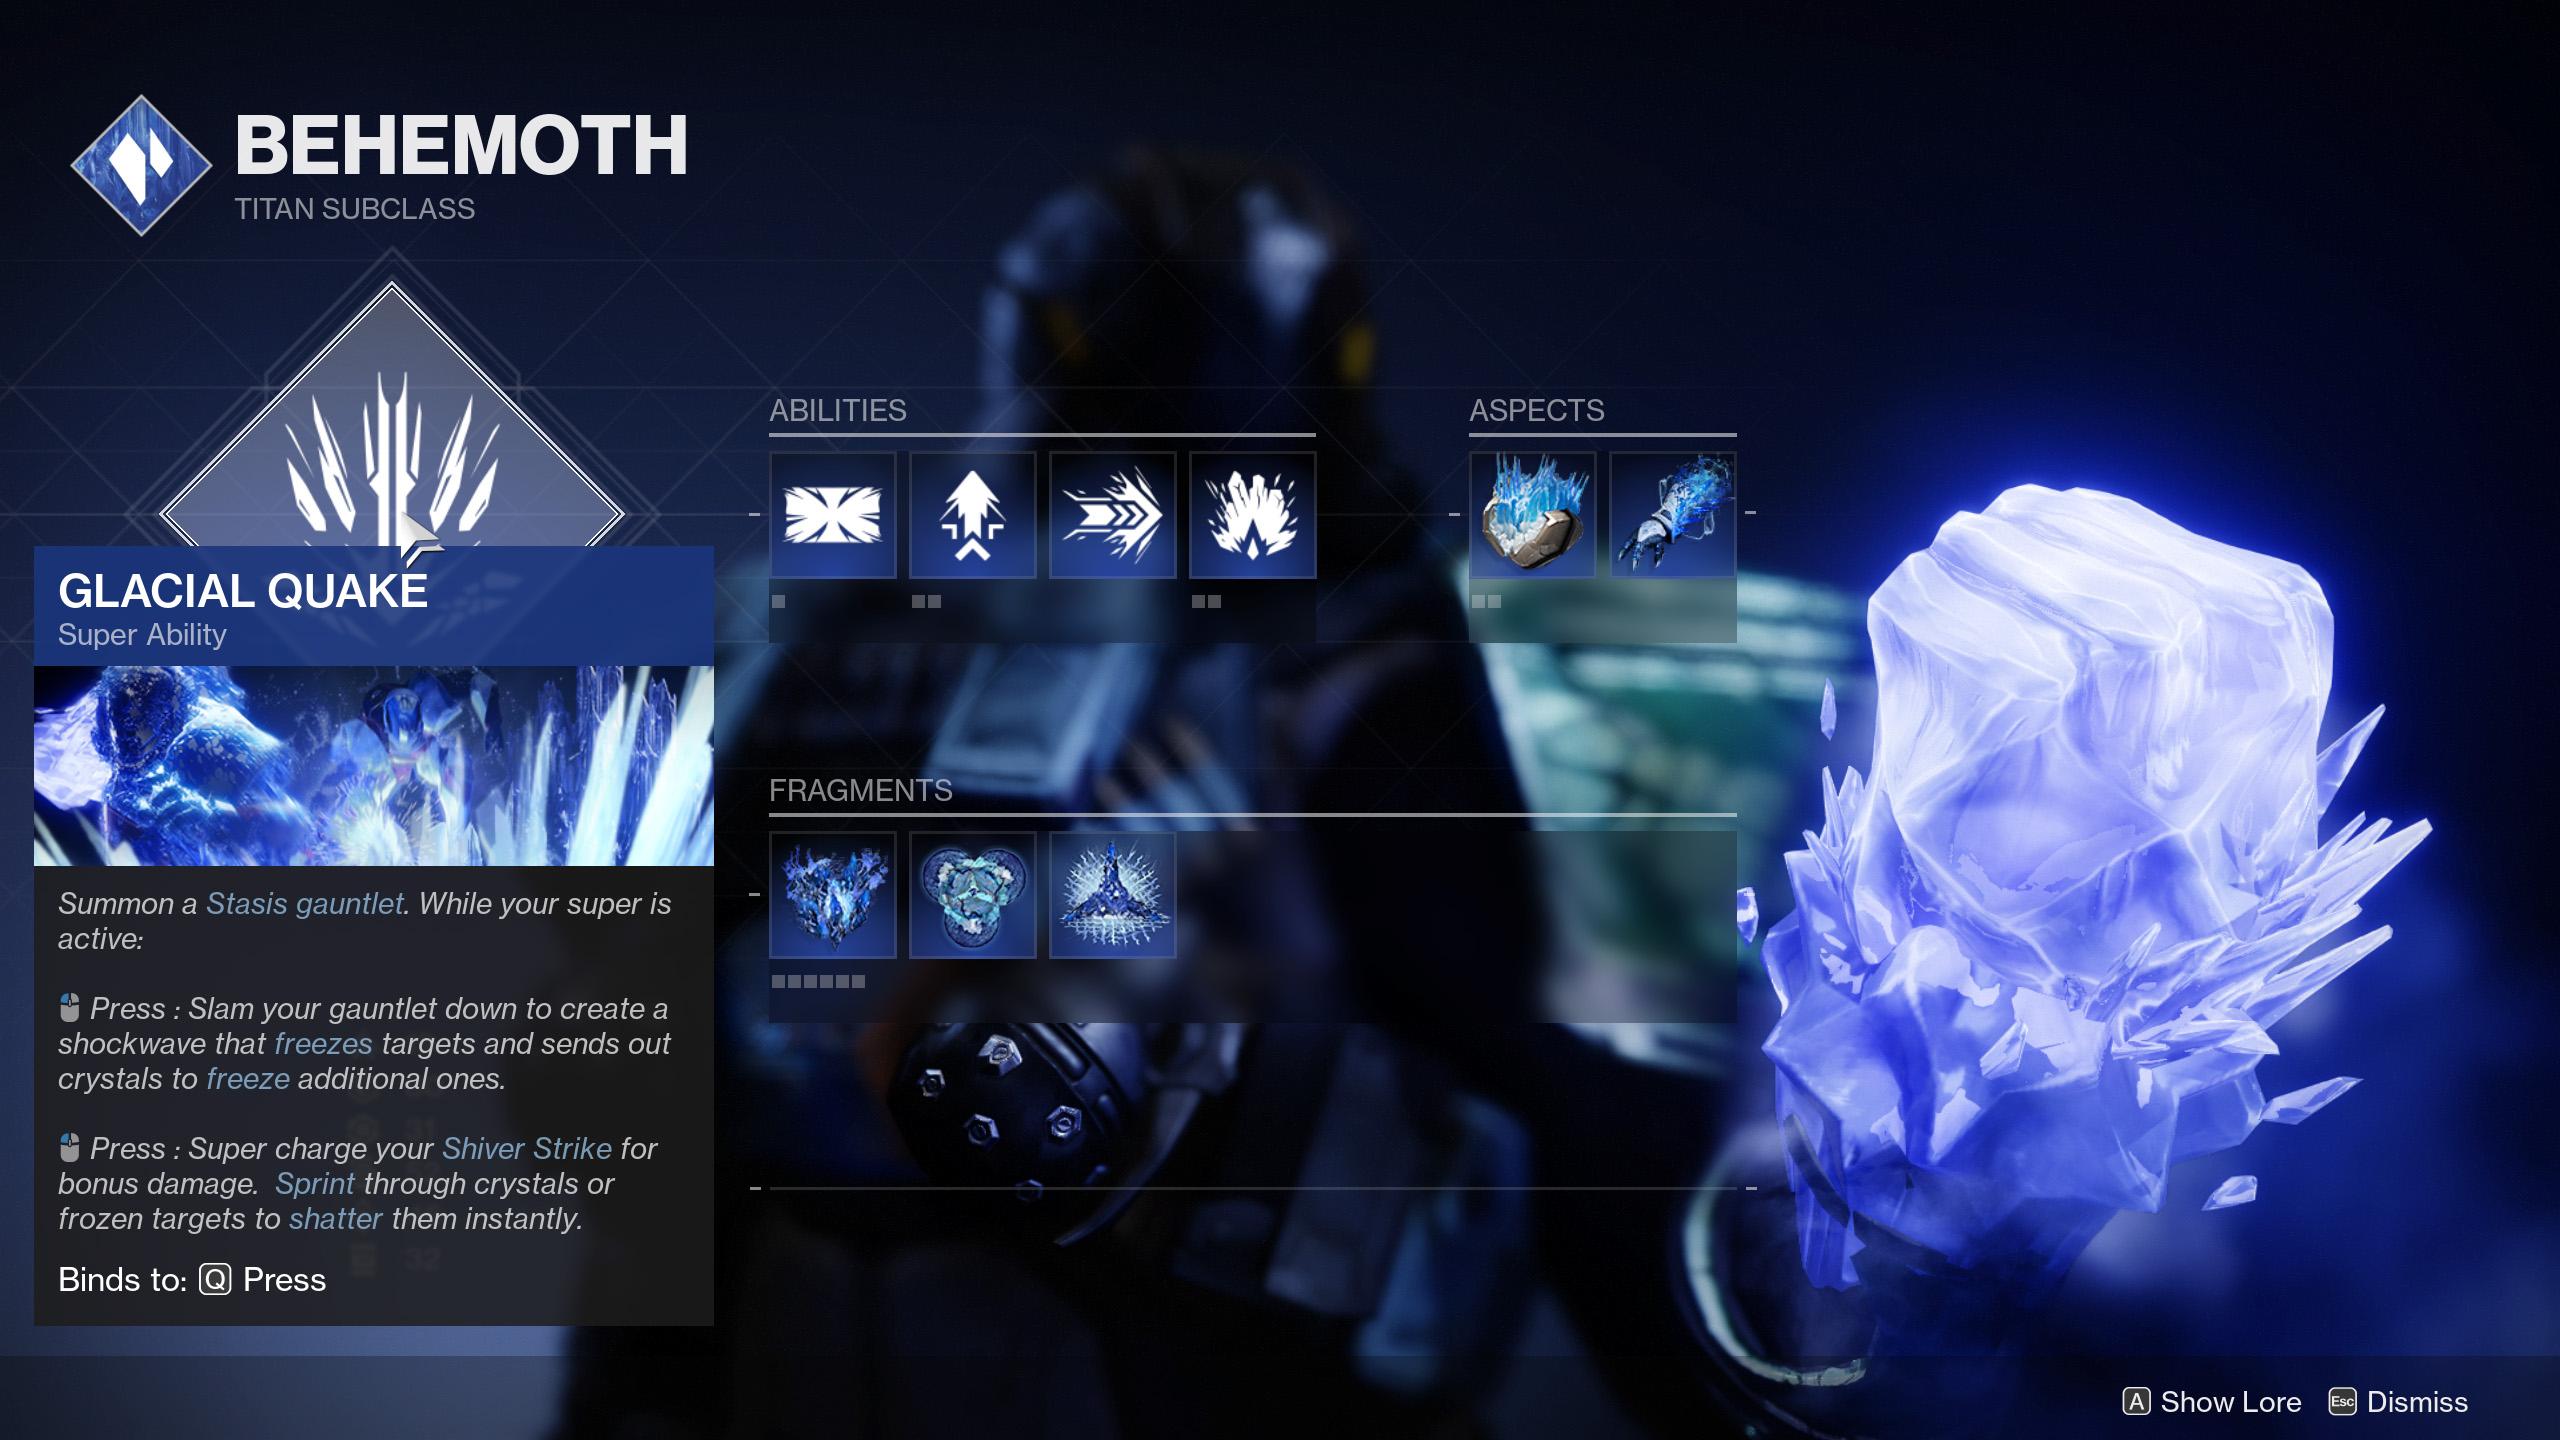 destiny 2 subclass titan behemoth